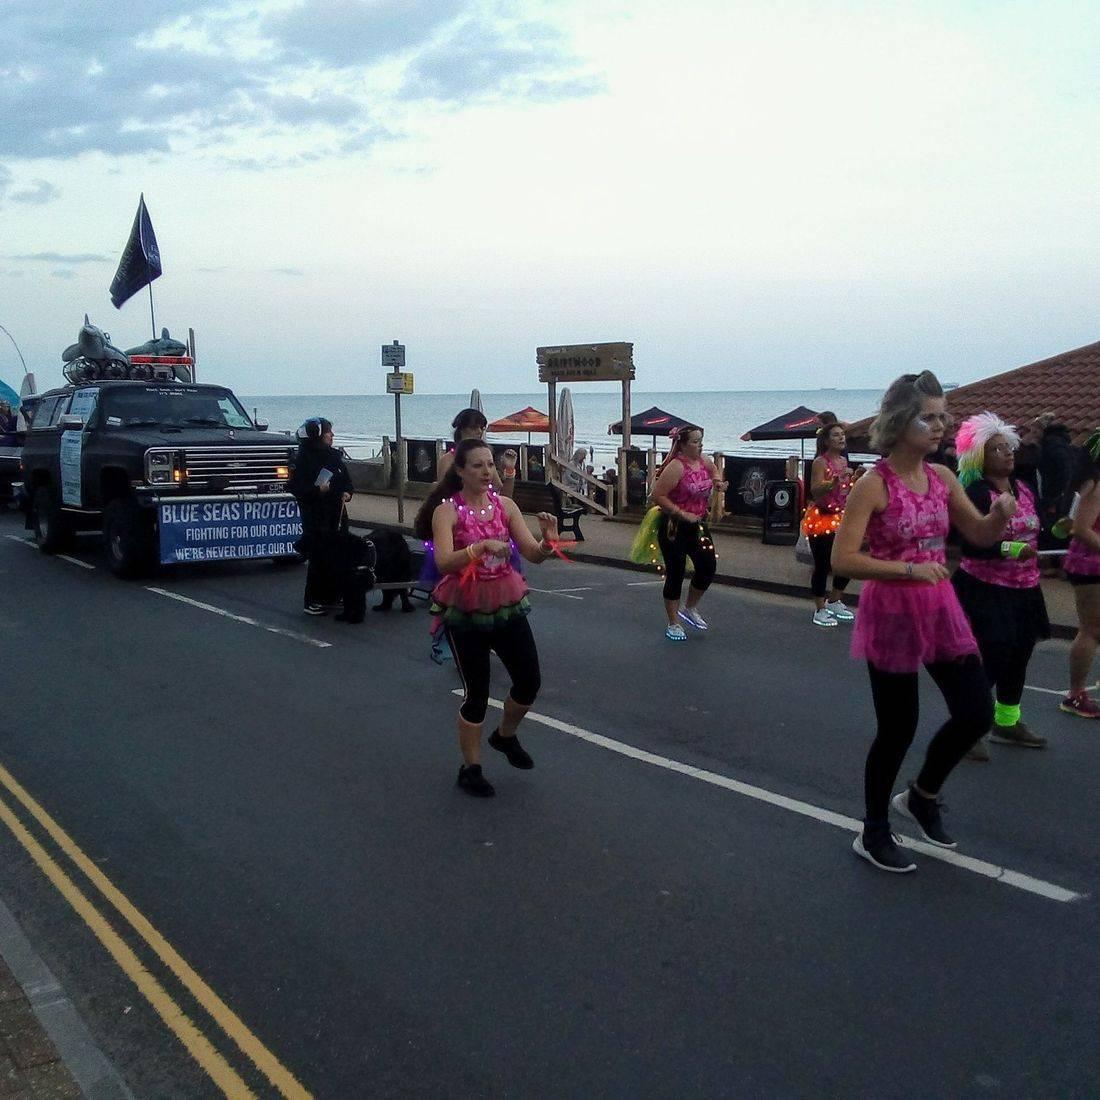 sea activistis  UK Isle of Wight